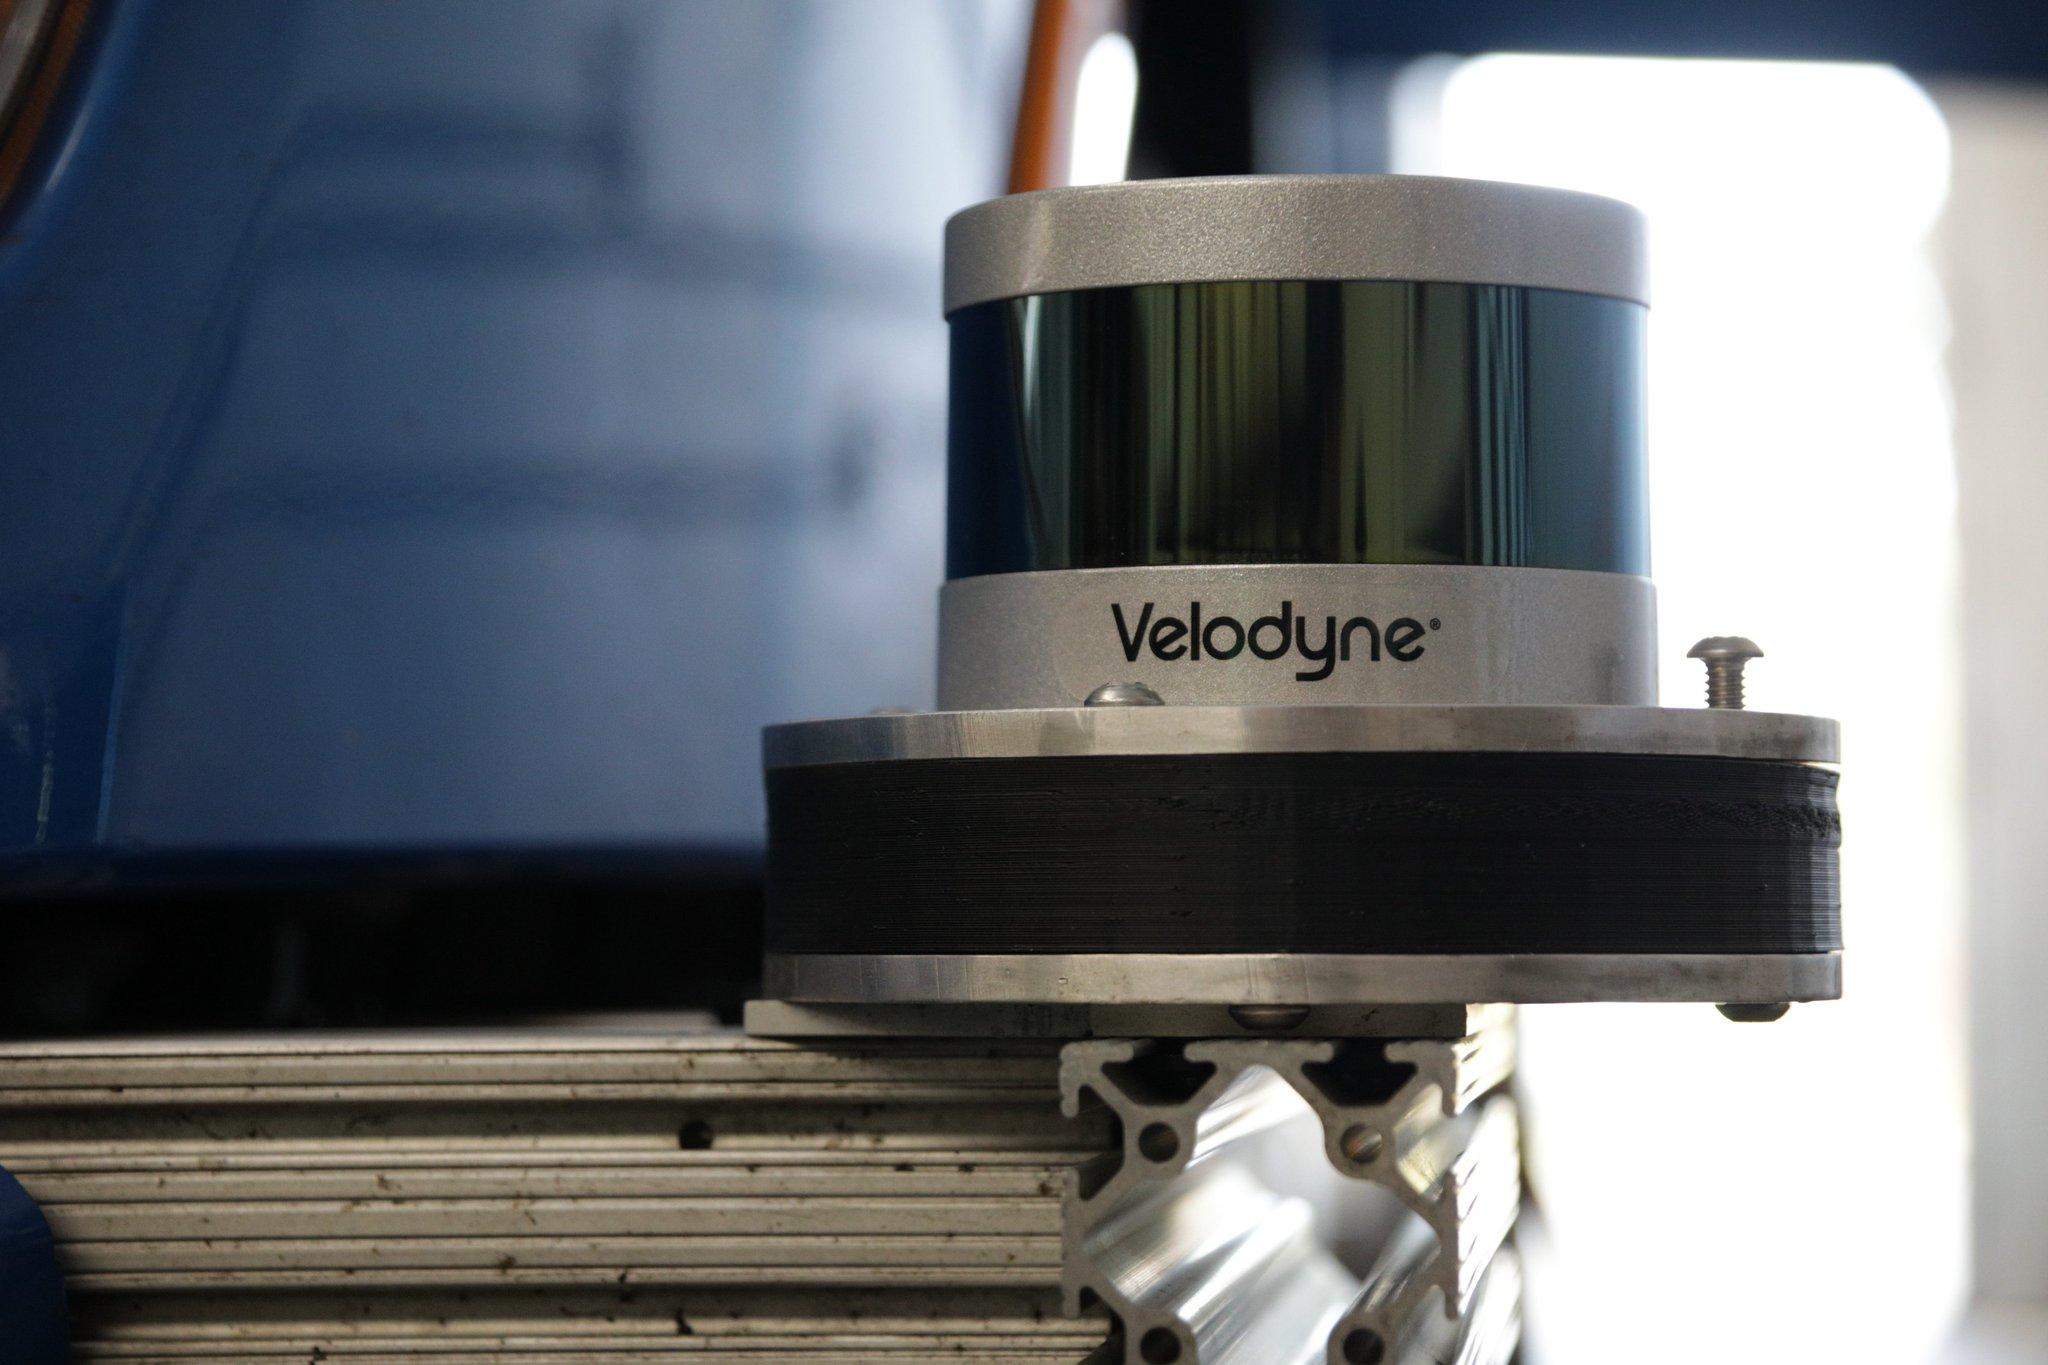 Velodyne quadruples LiDAR production to meet self-driving demand https://t.co/SjDInNZMuy by @etherington https://t.co/nBeulzrkk3